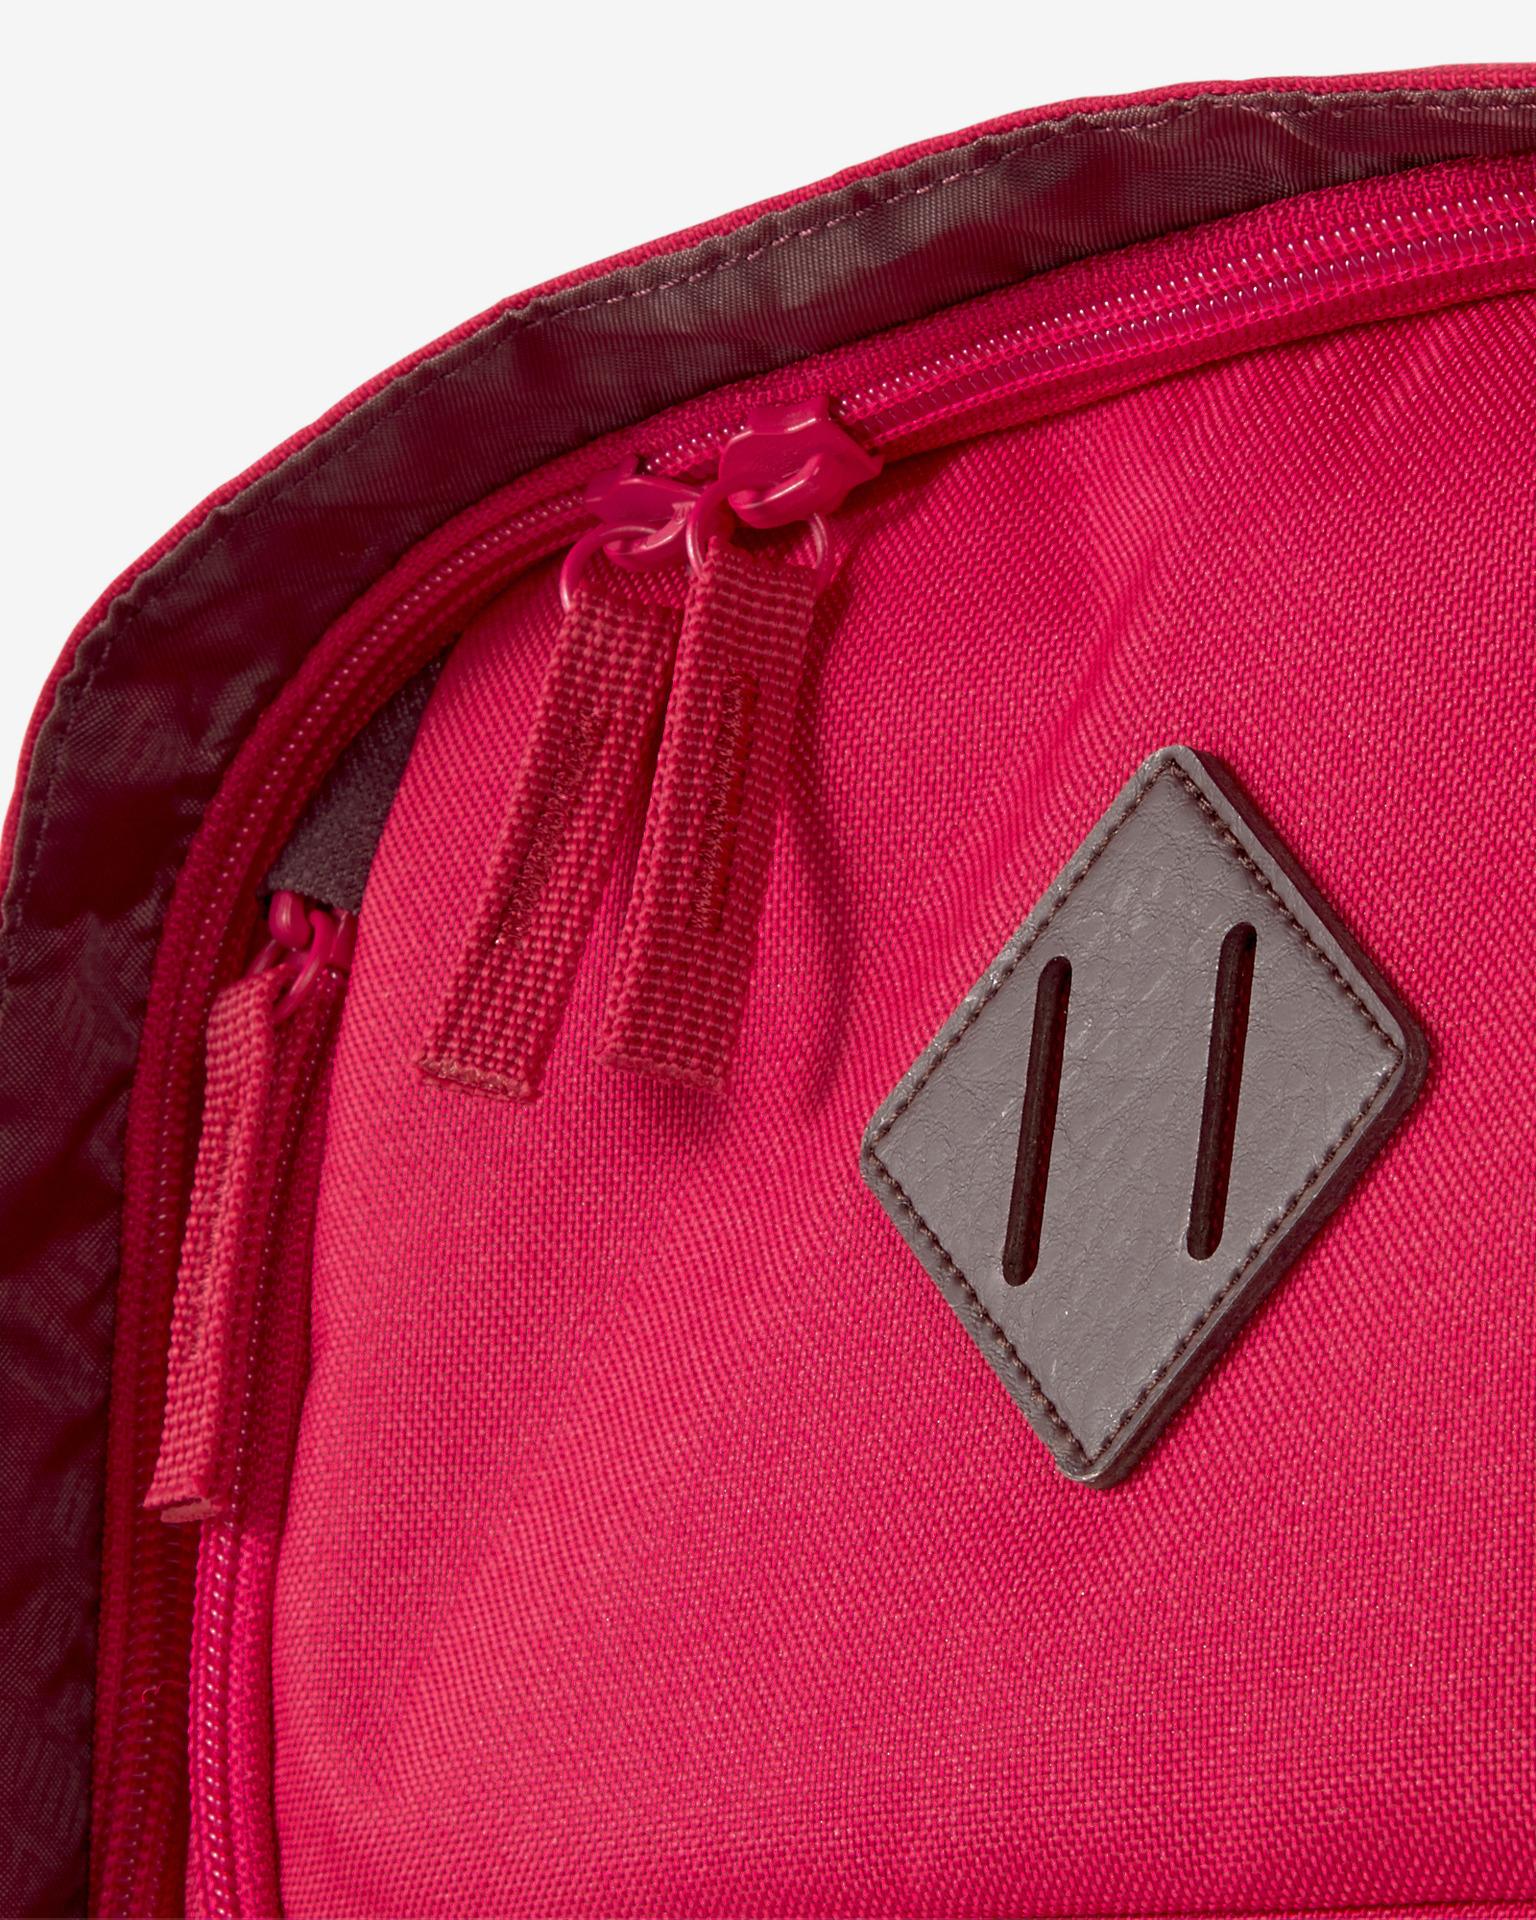 Puma Plecak damski różowy Batoh